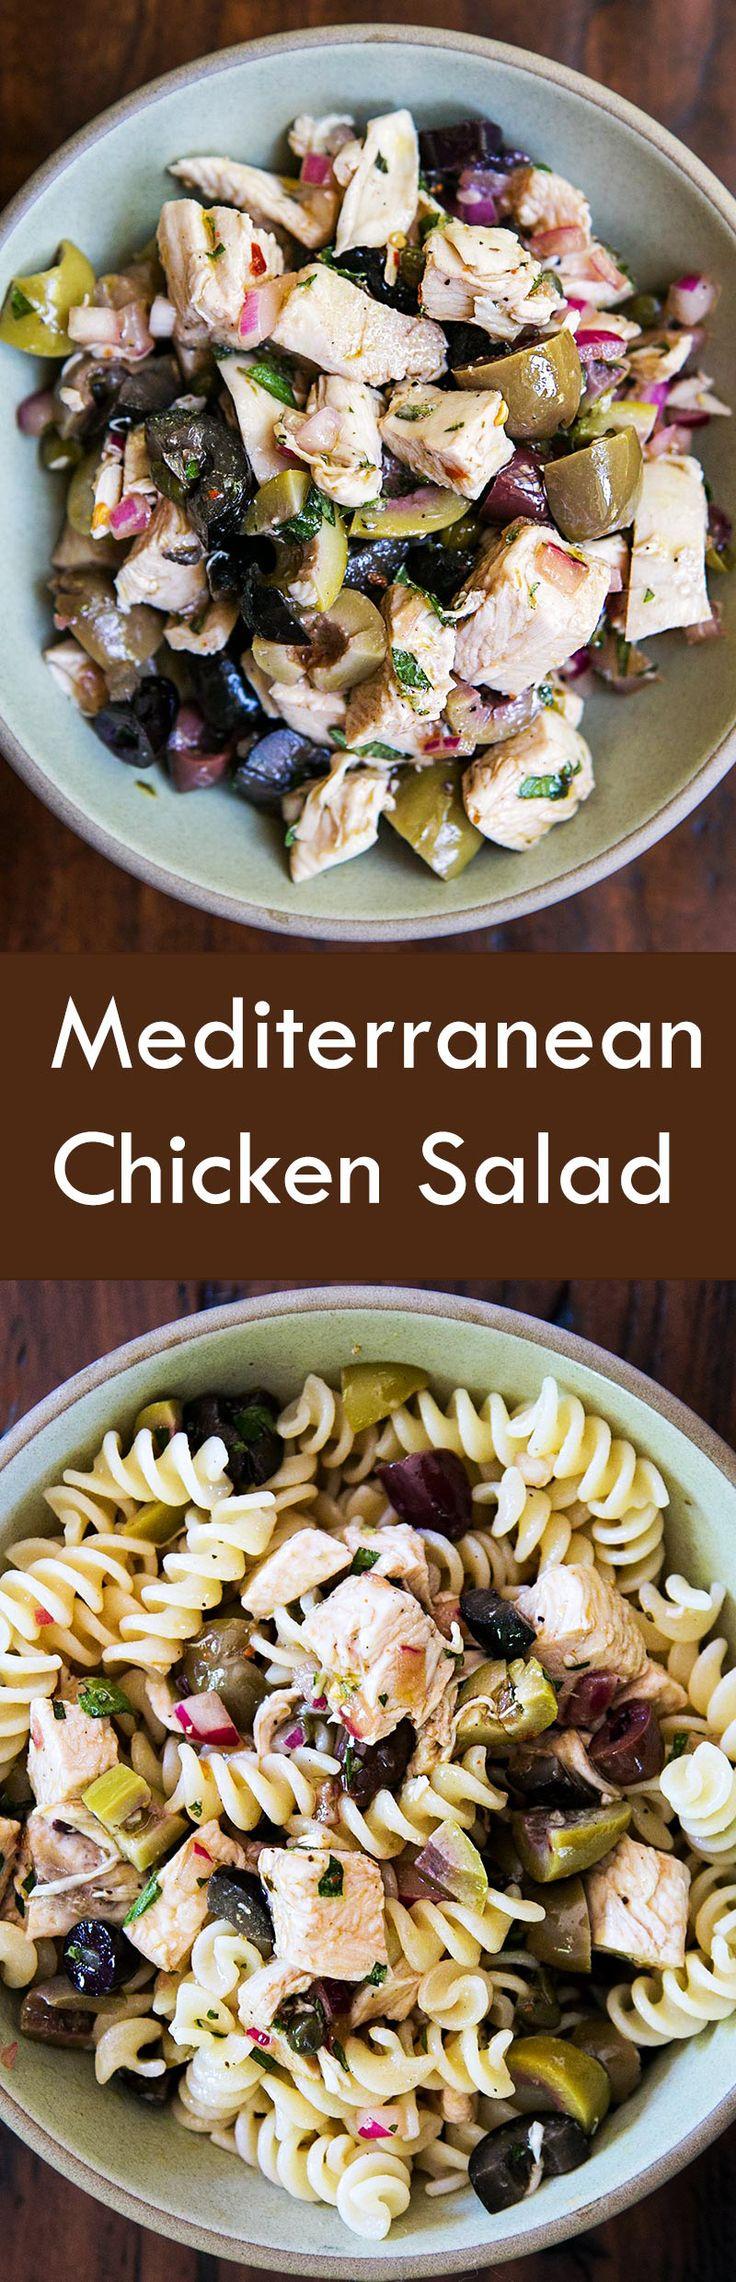 Chicken salad simply recipes